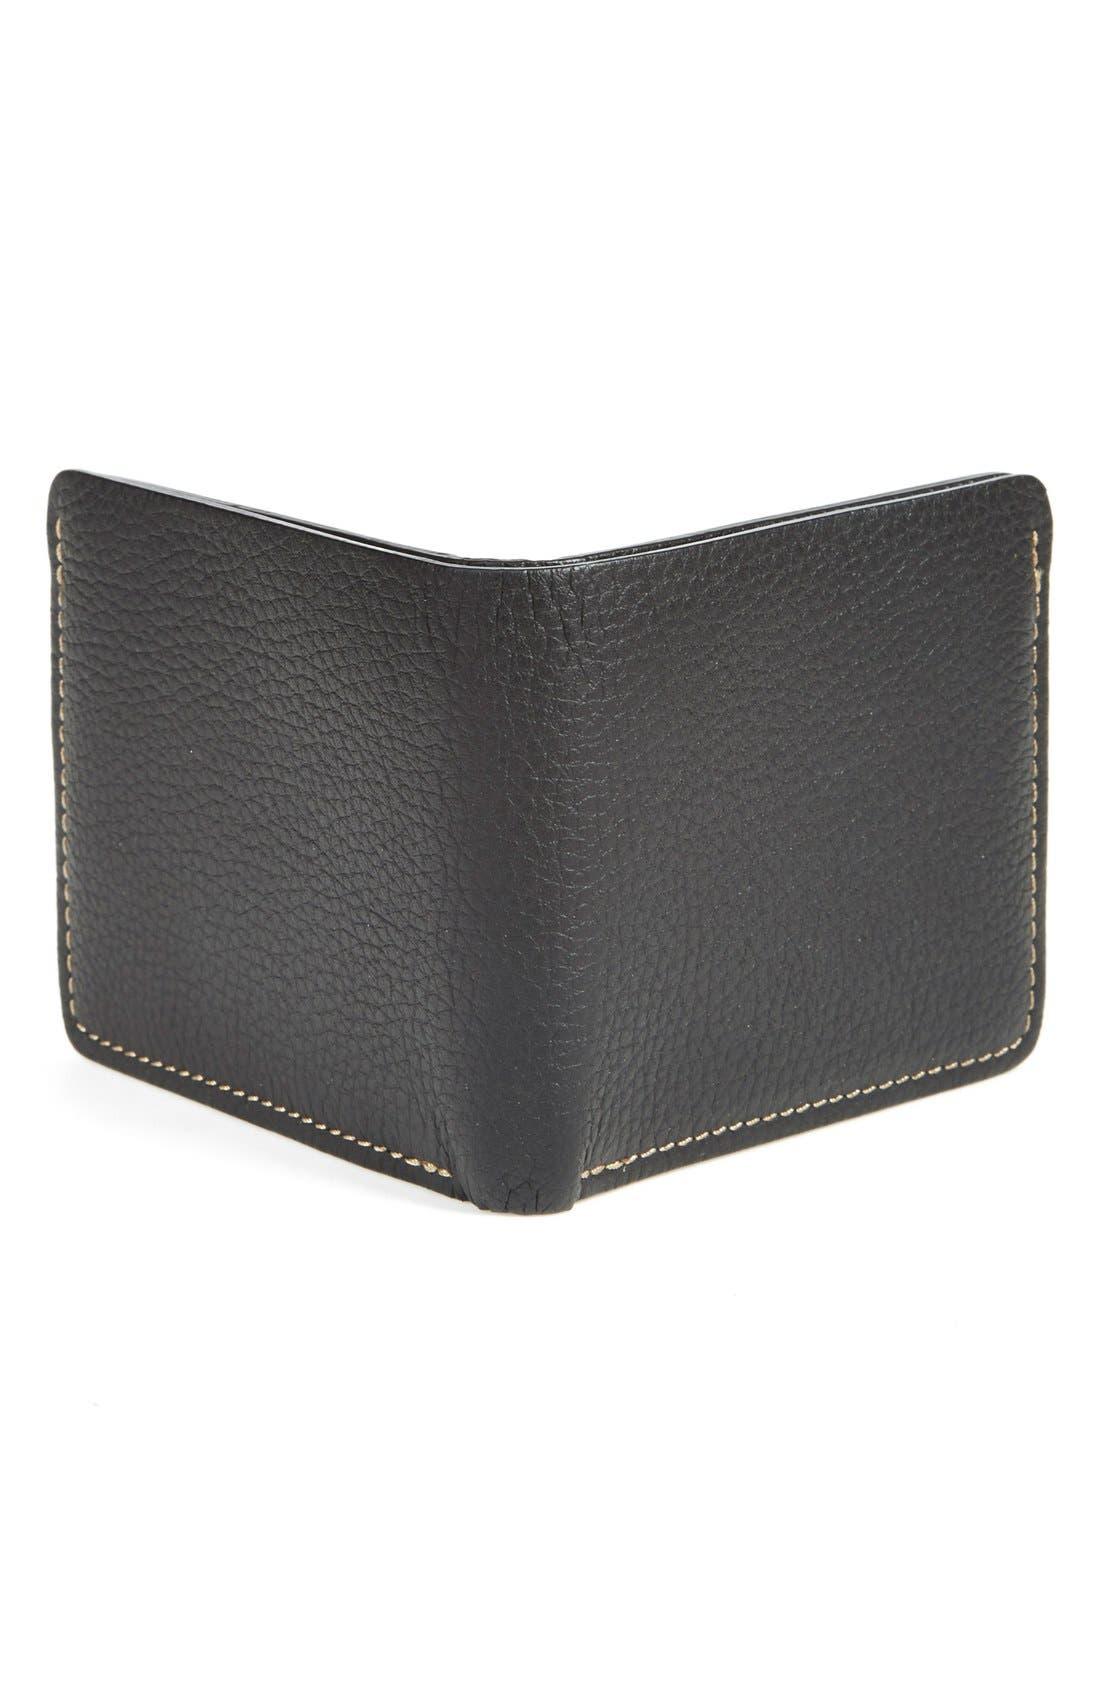 'Jackson' Bison Leather Wallet,                             Alternate thumbnail 8, color,